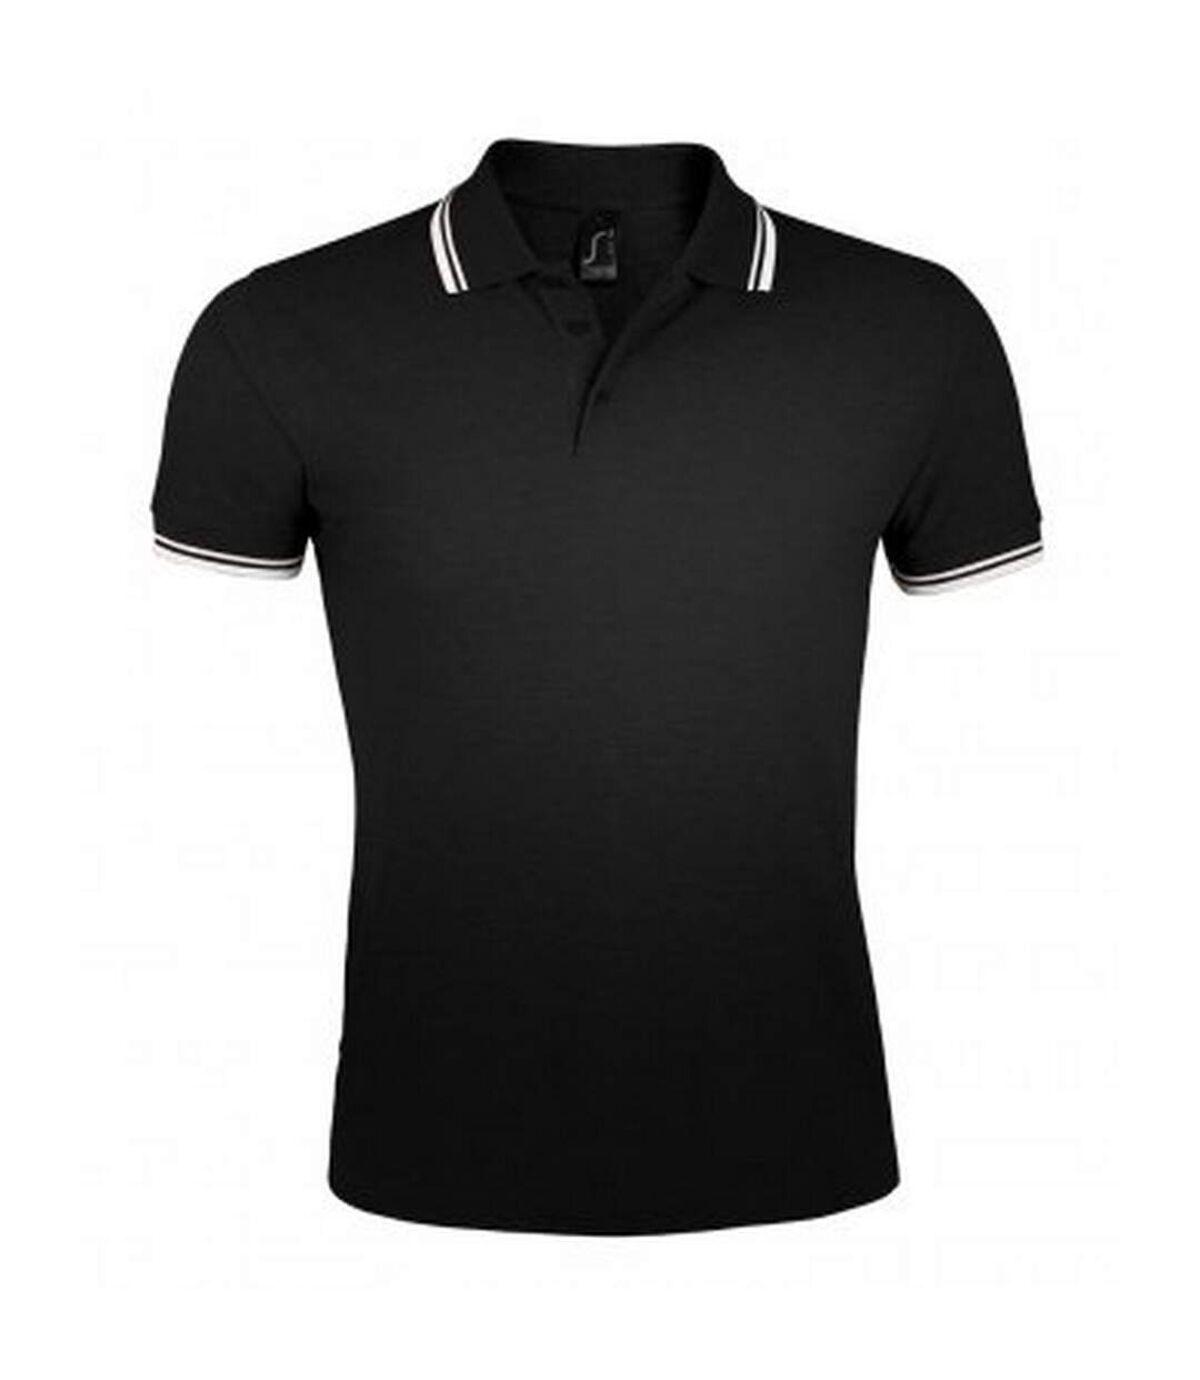 SOLS Mens Pasadena Tipped Short Sleeve Pique Polo Shirt (Black/White) - UTPC2431